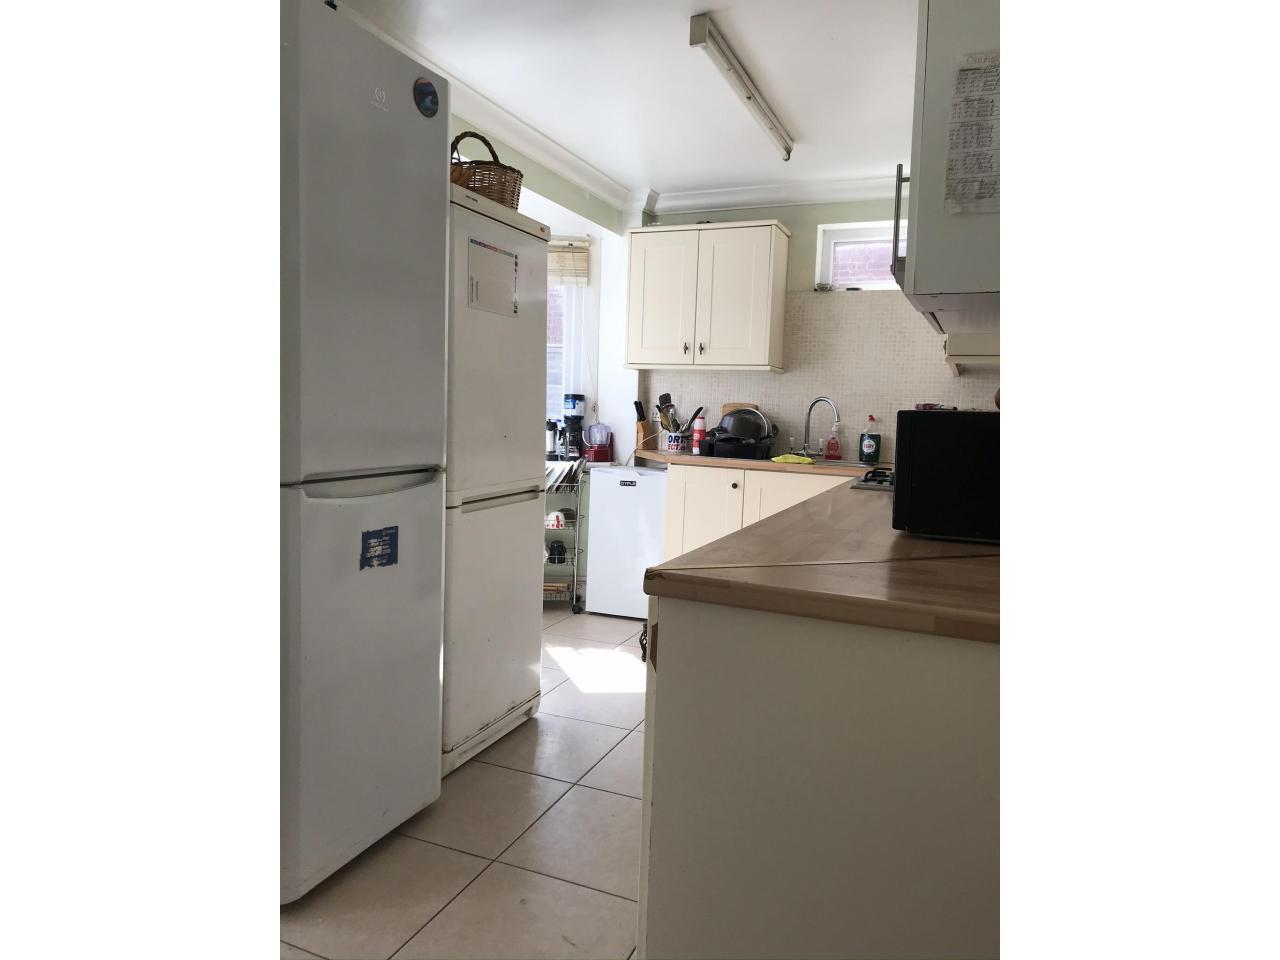 Double Kомната в аренду - Harlesden, Willesden Junction - все счета включены - 4